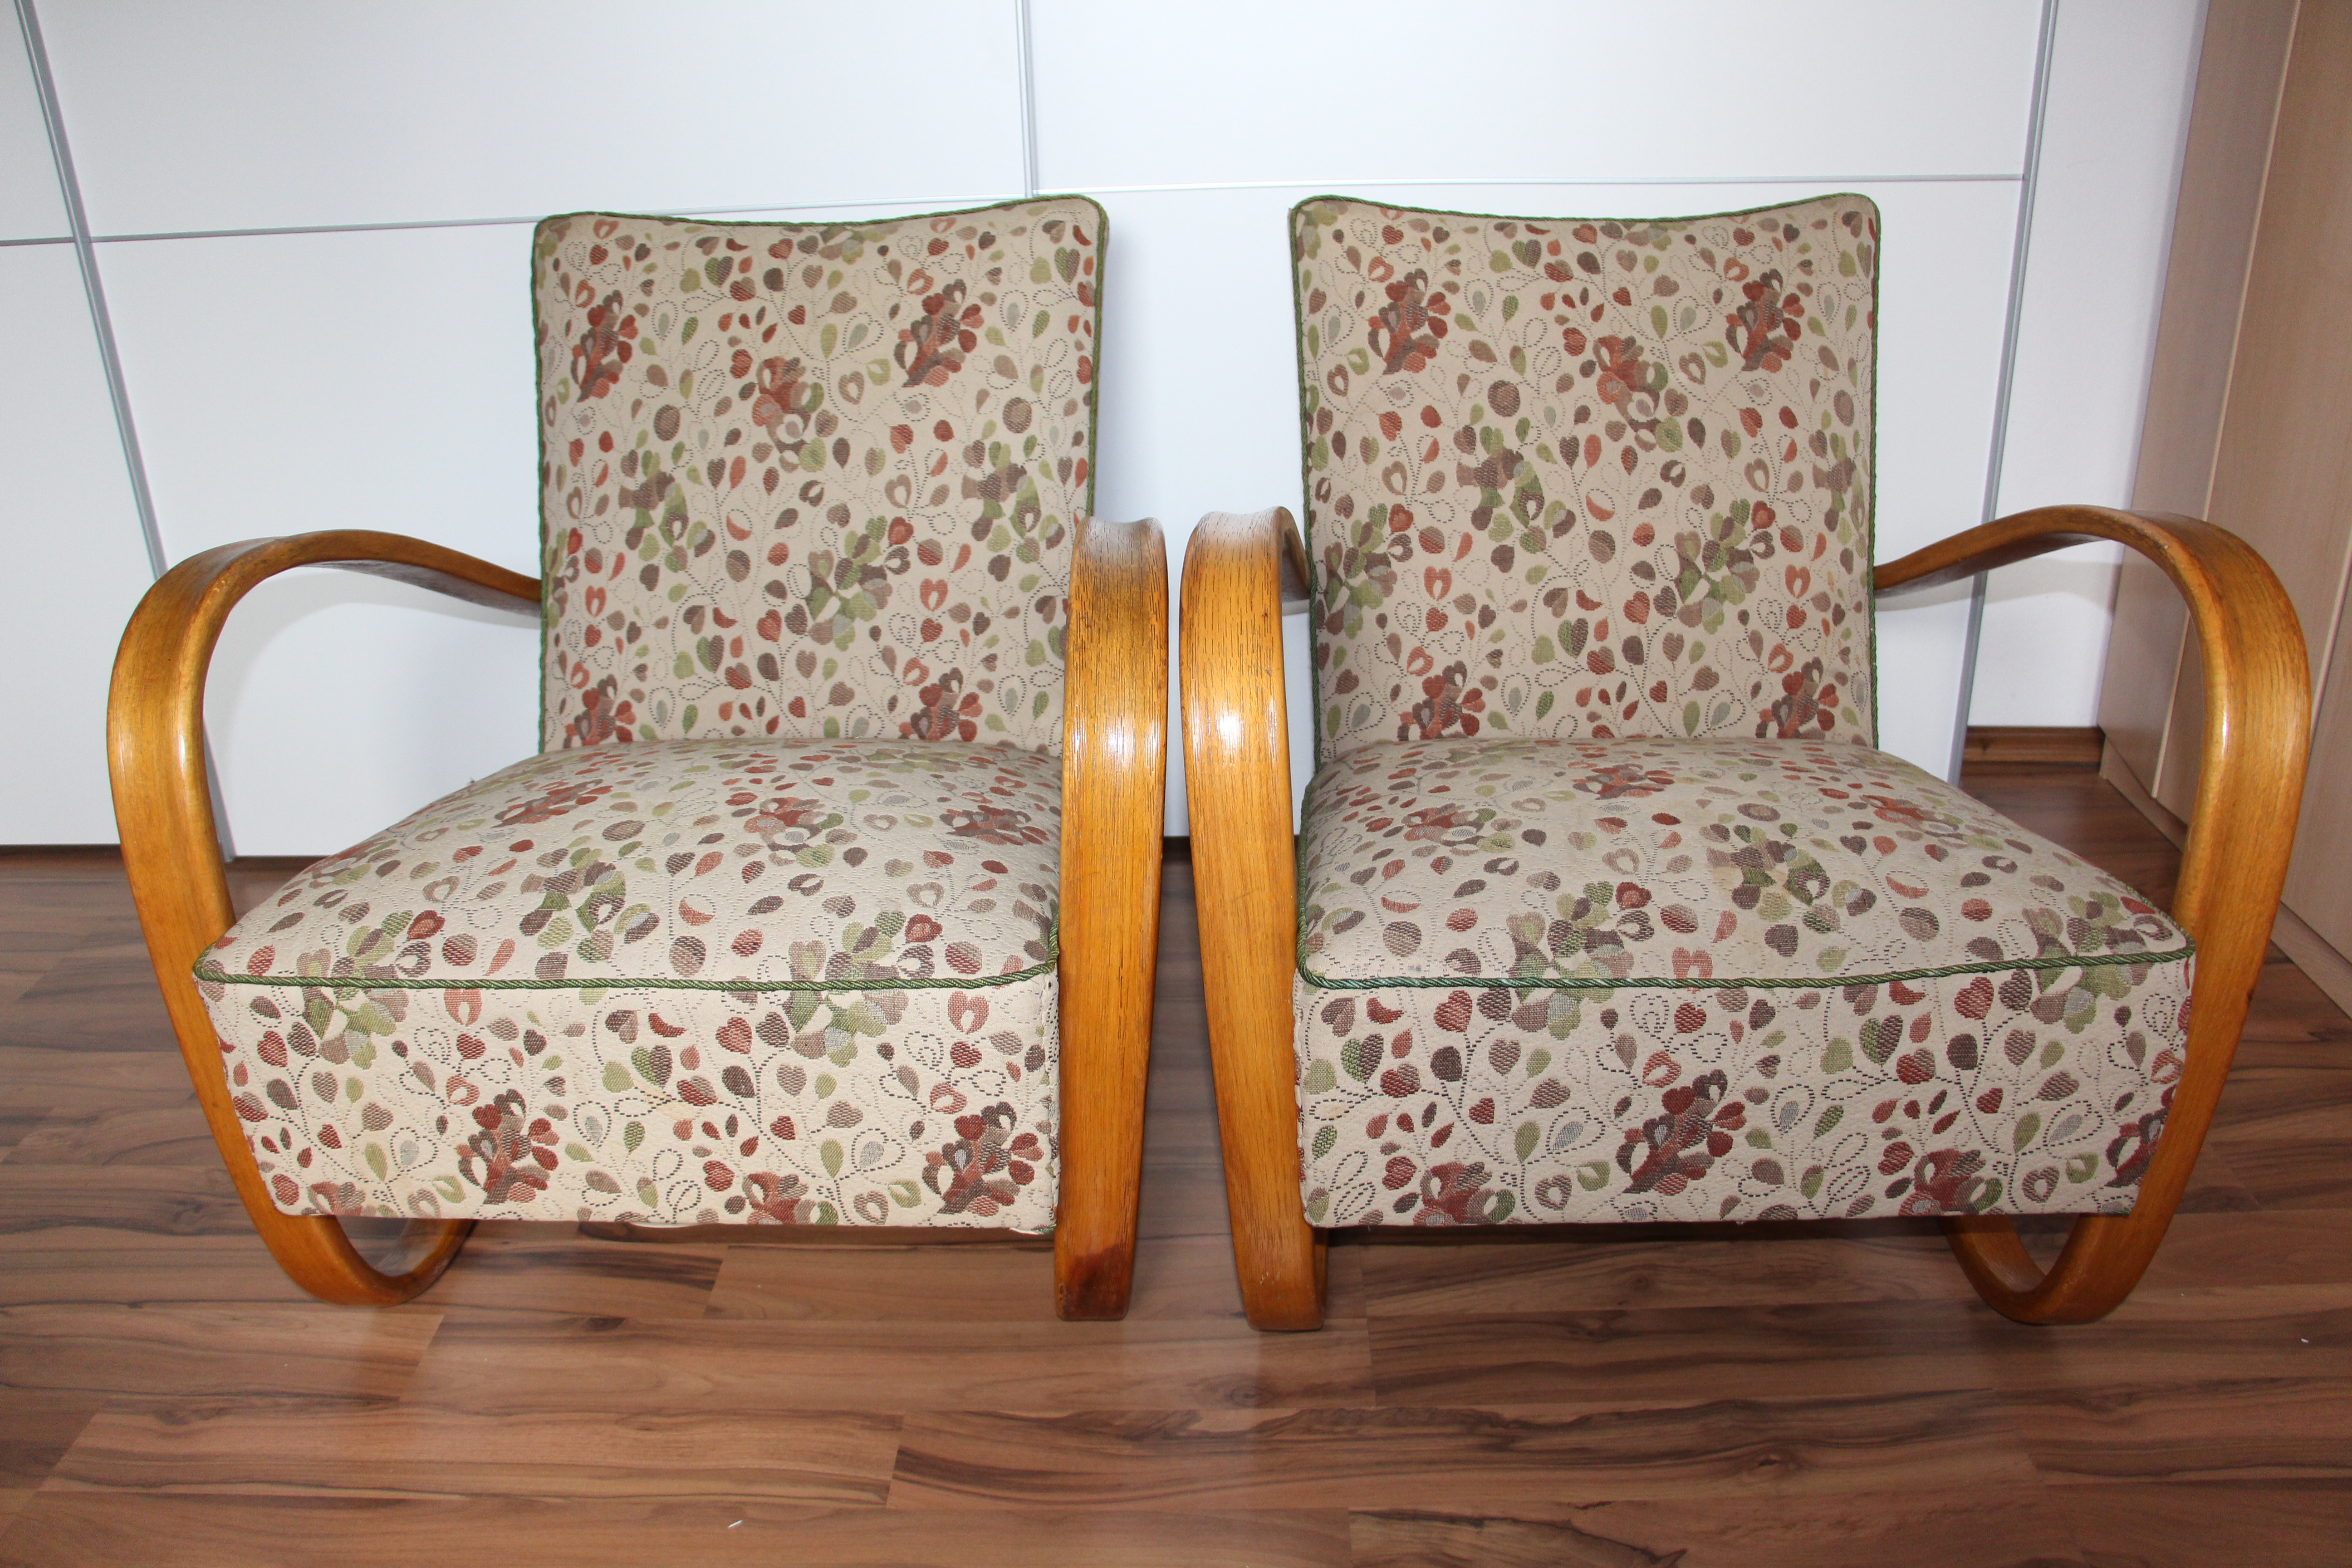 2 halabala sessel h269 halabala s armchairs antik. Black Bedroom Furniture Sets. Home Design Ideas